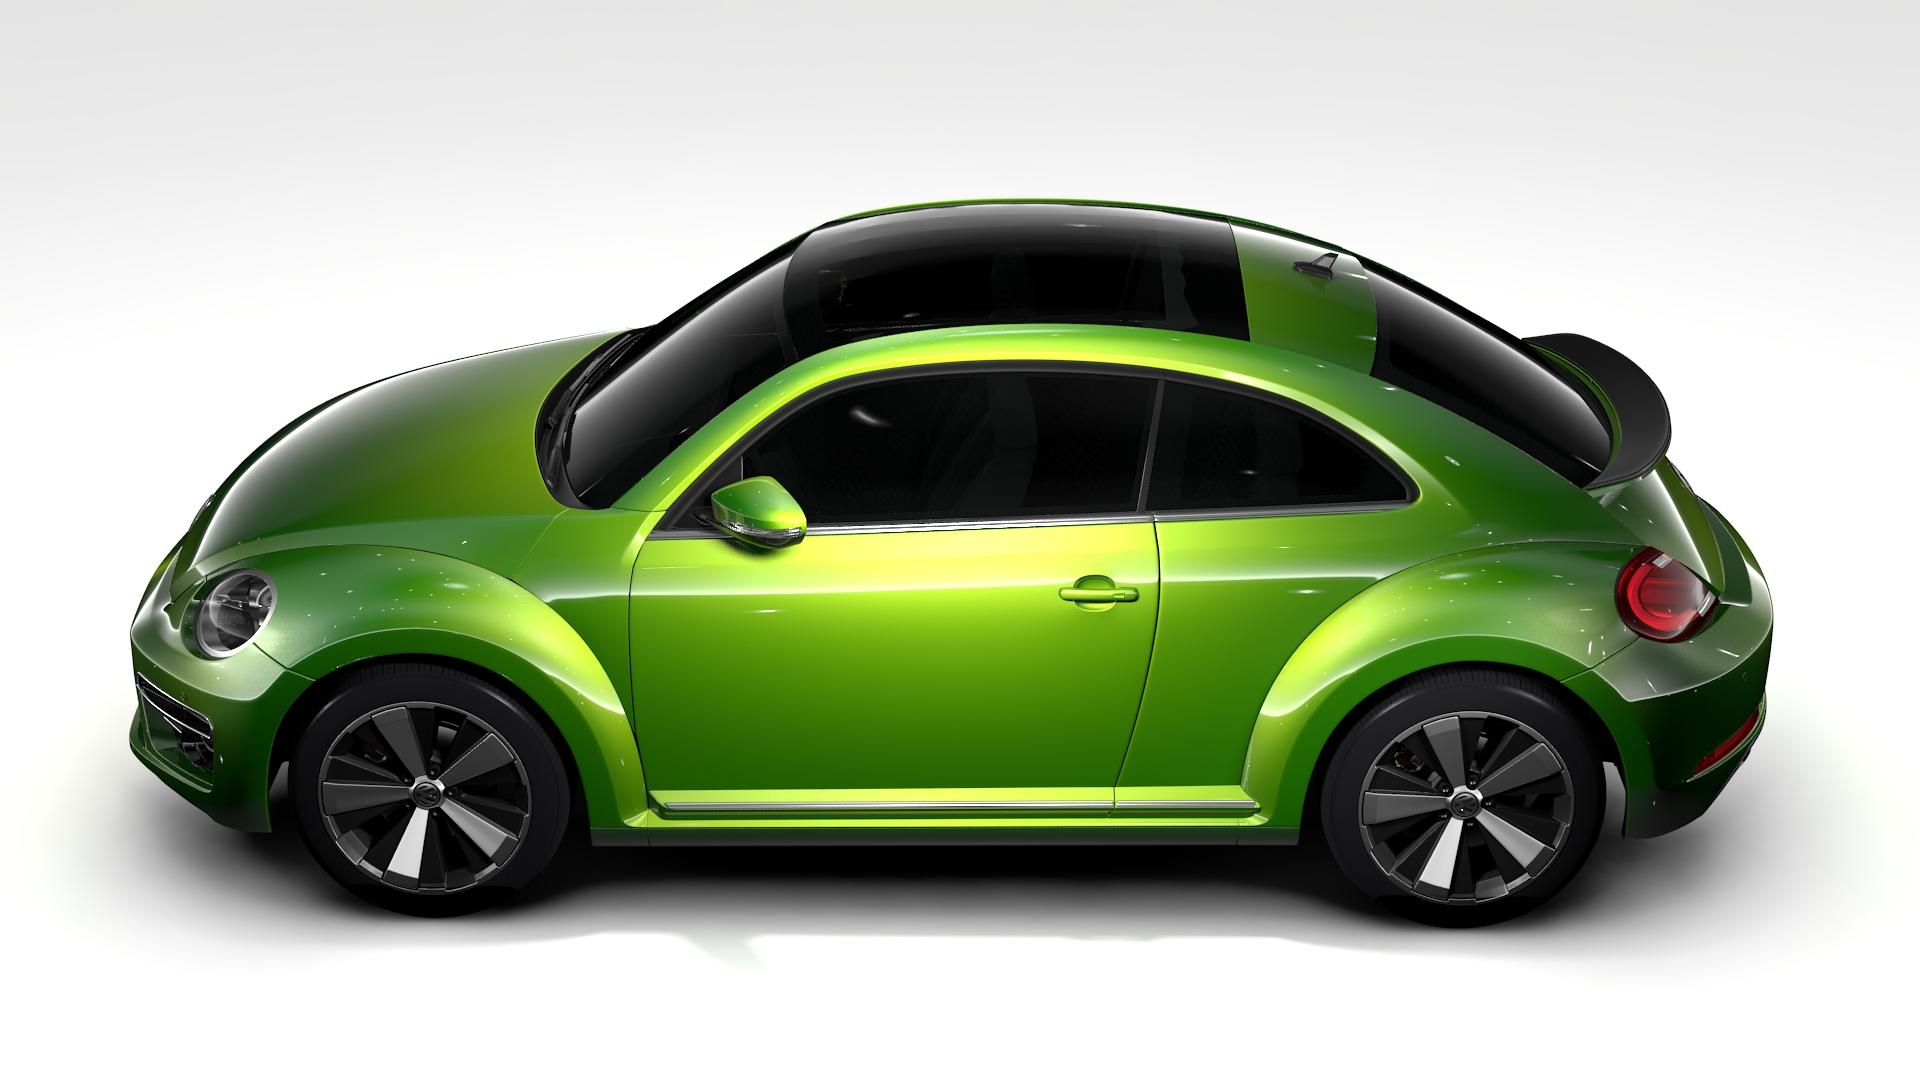 vw beetle 2017 3d model 3ds max fbx c4d lwo ma mb hrc xsi obj 221575